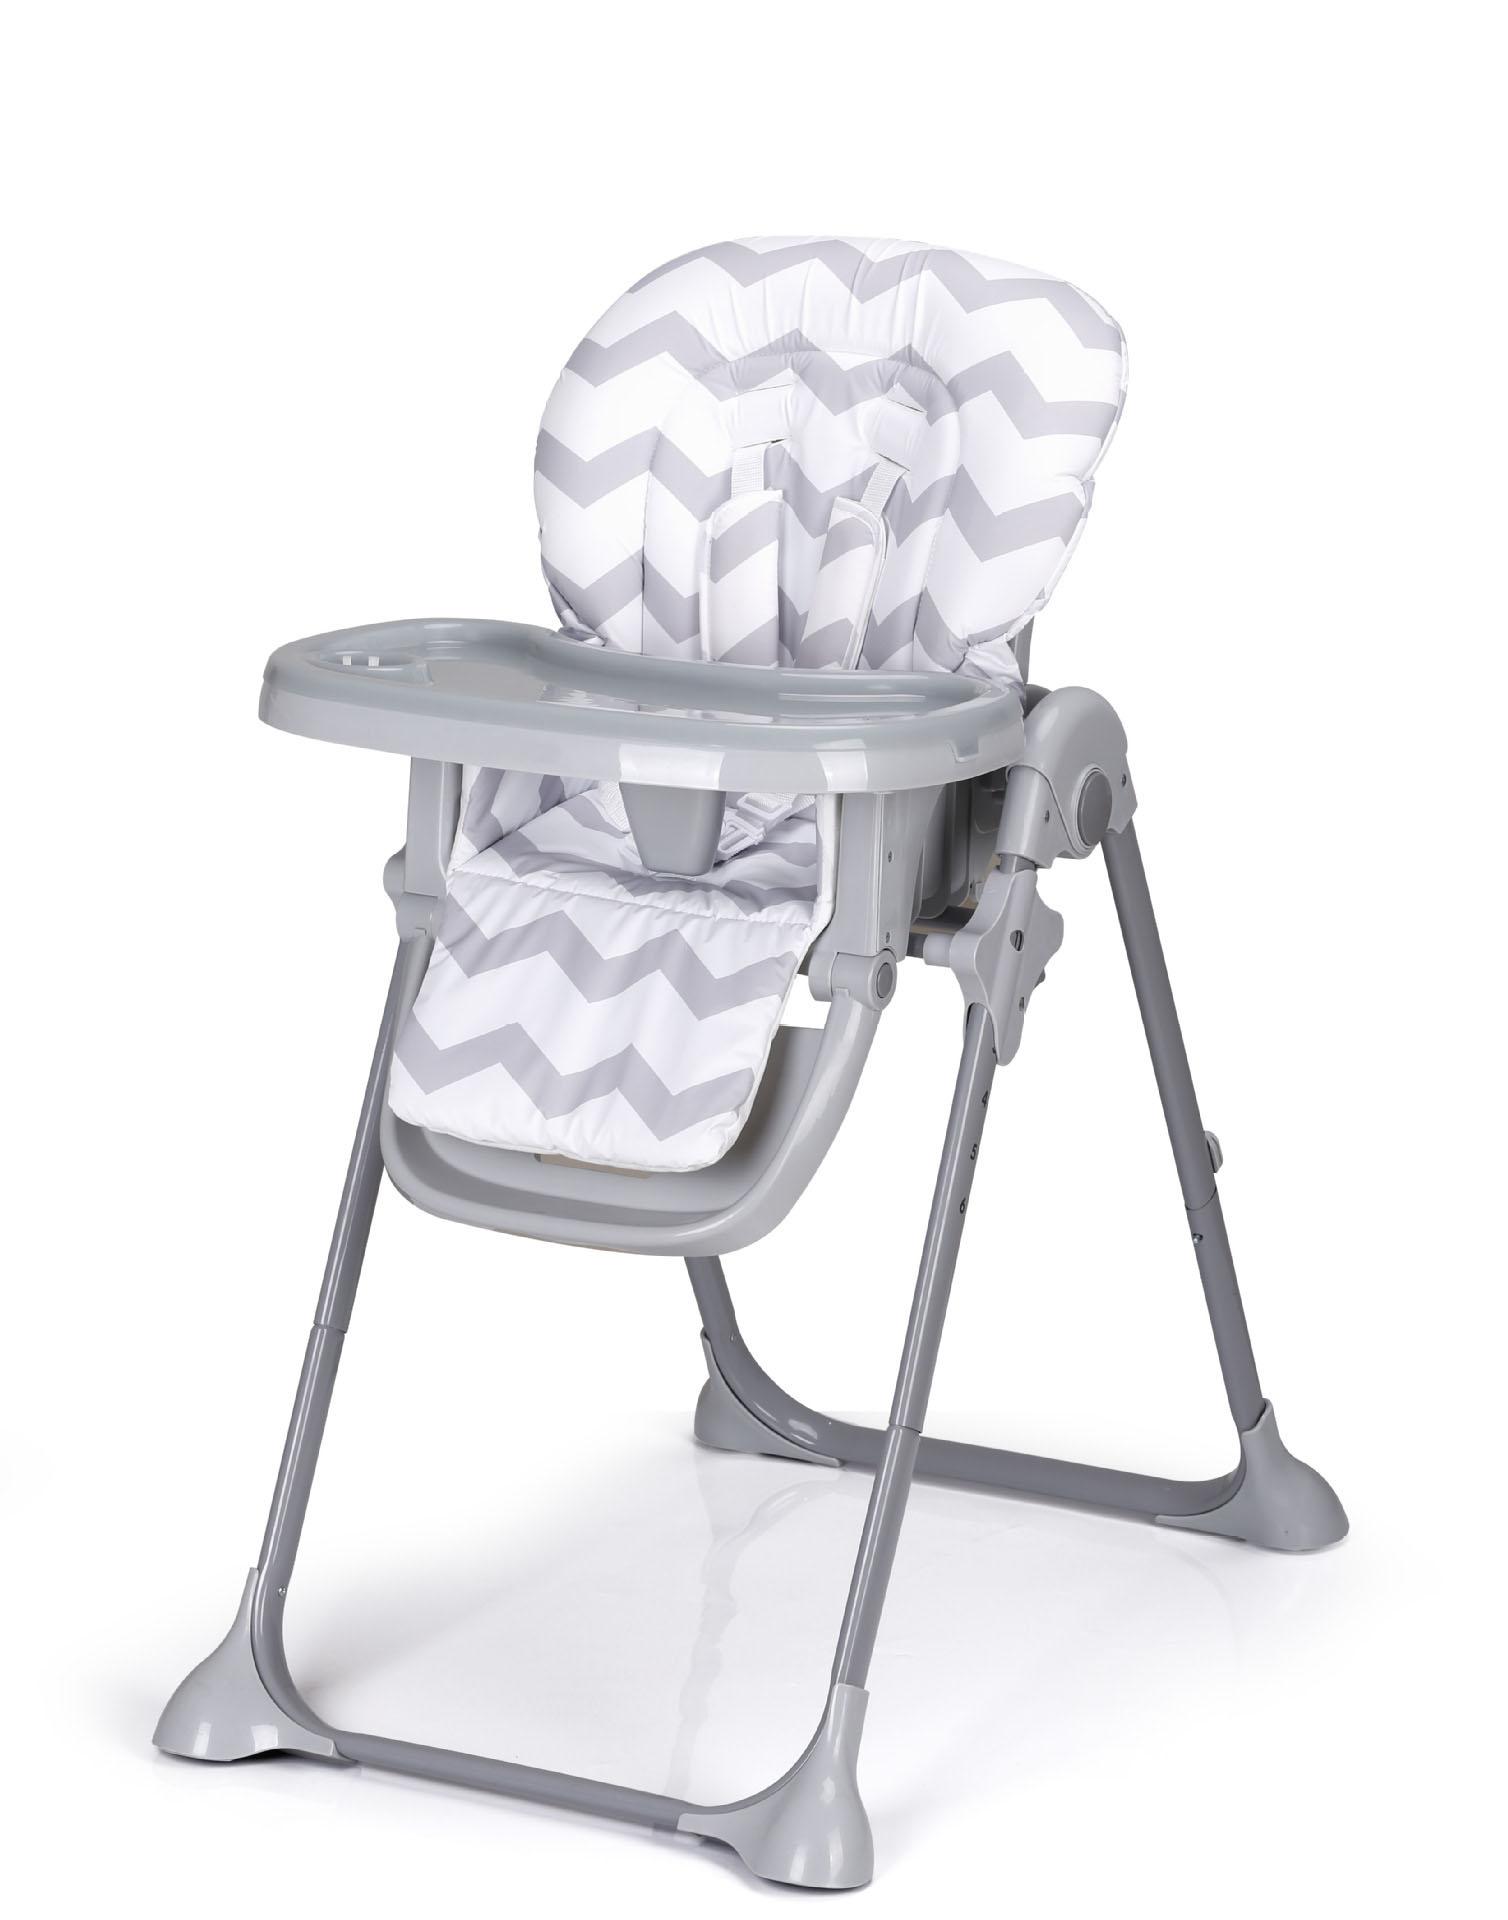 Harari Baby simple plastic baby high chair company for feeding-2